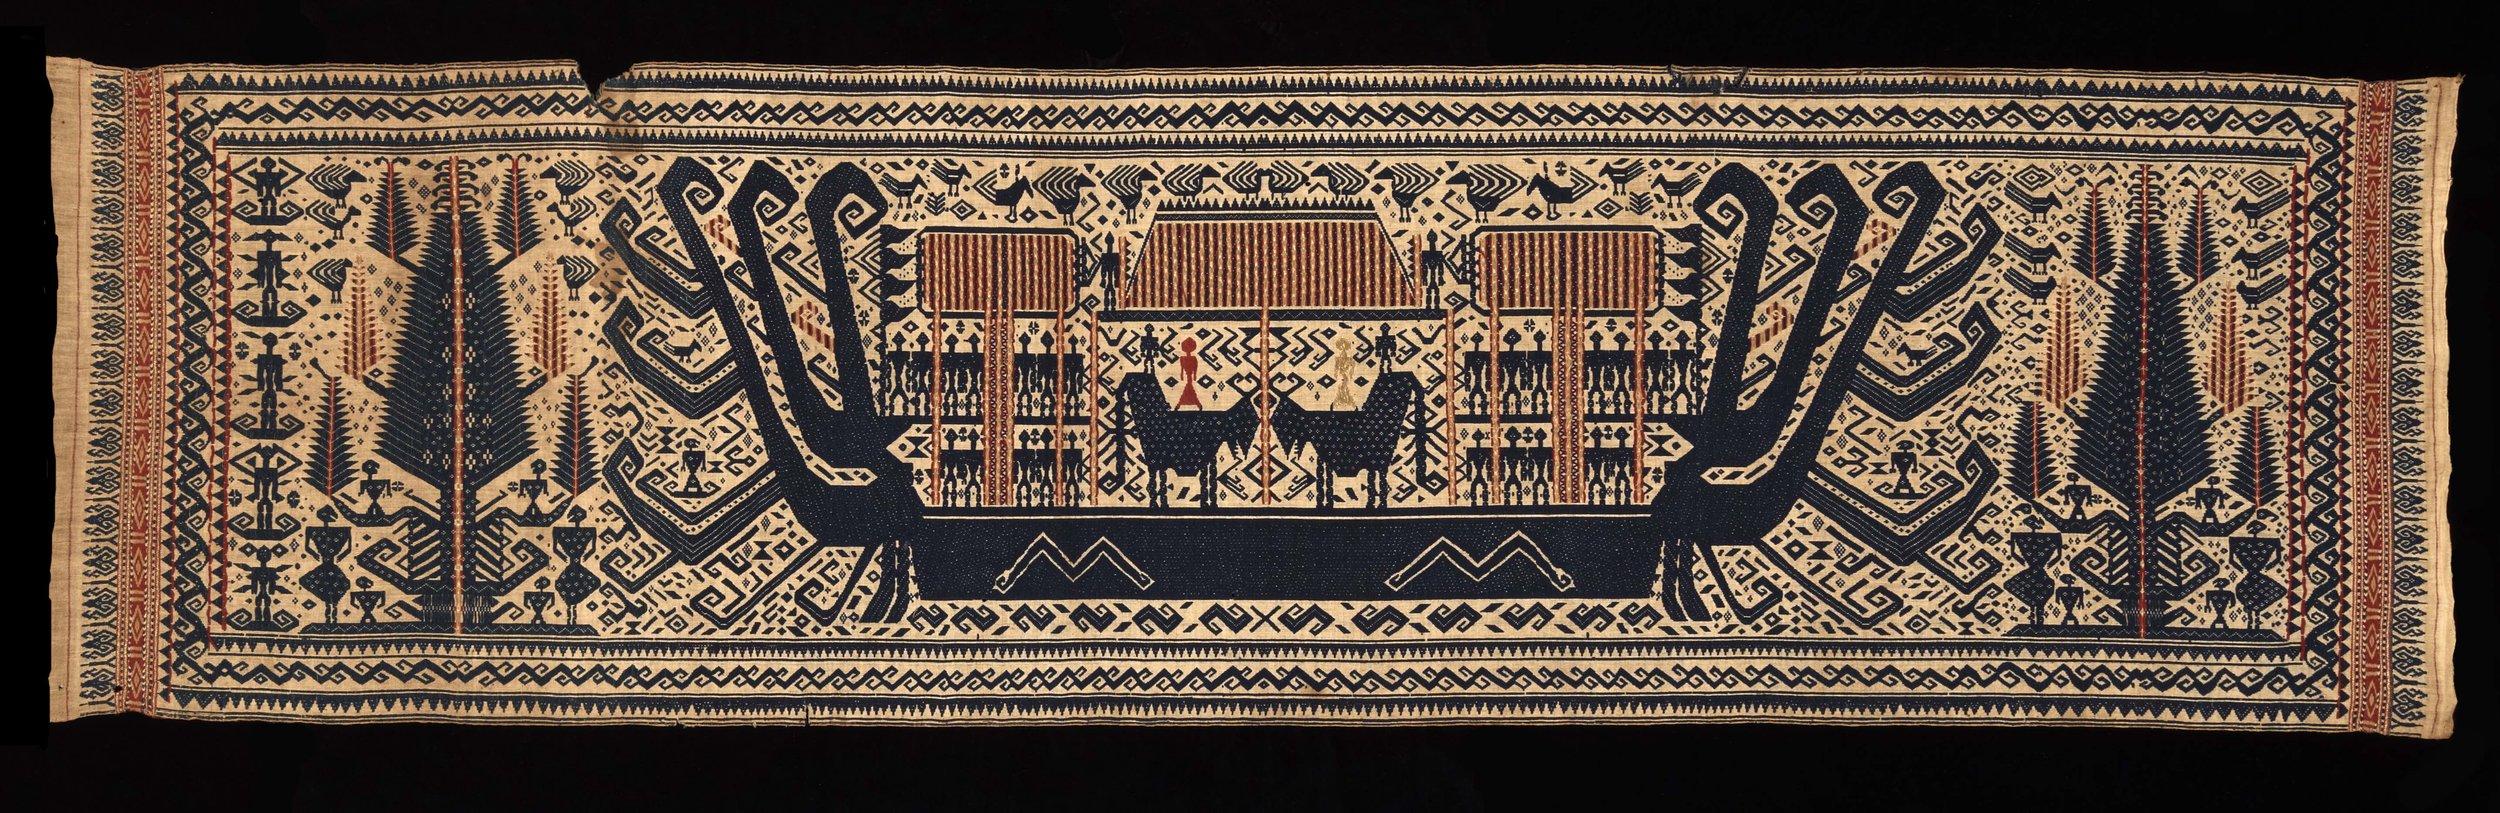 Ceremonial Banner Cloth |  Palepai  © The Dallas Museum of Art | Texas, USA